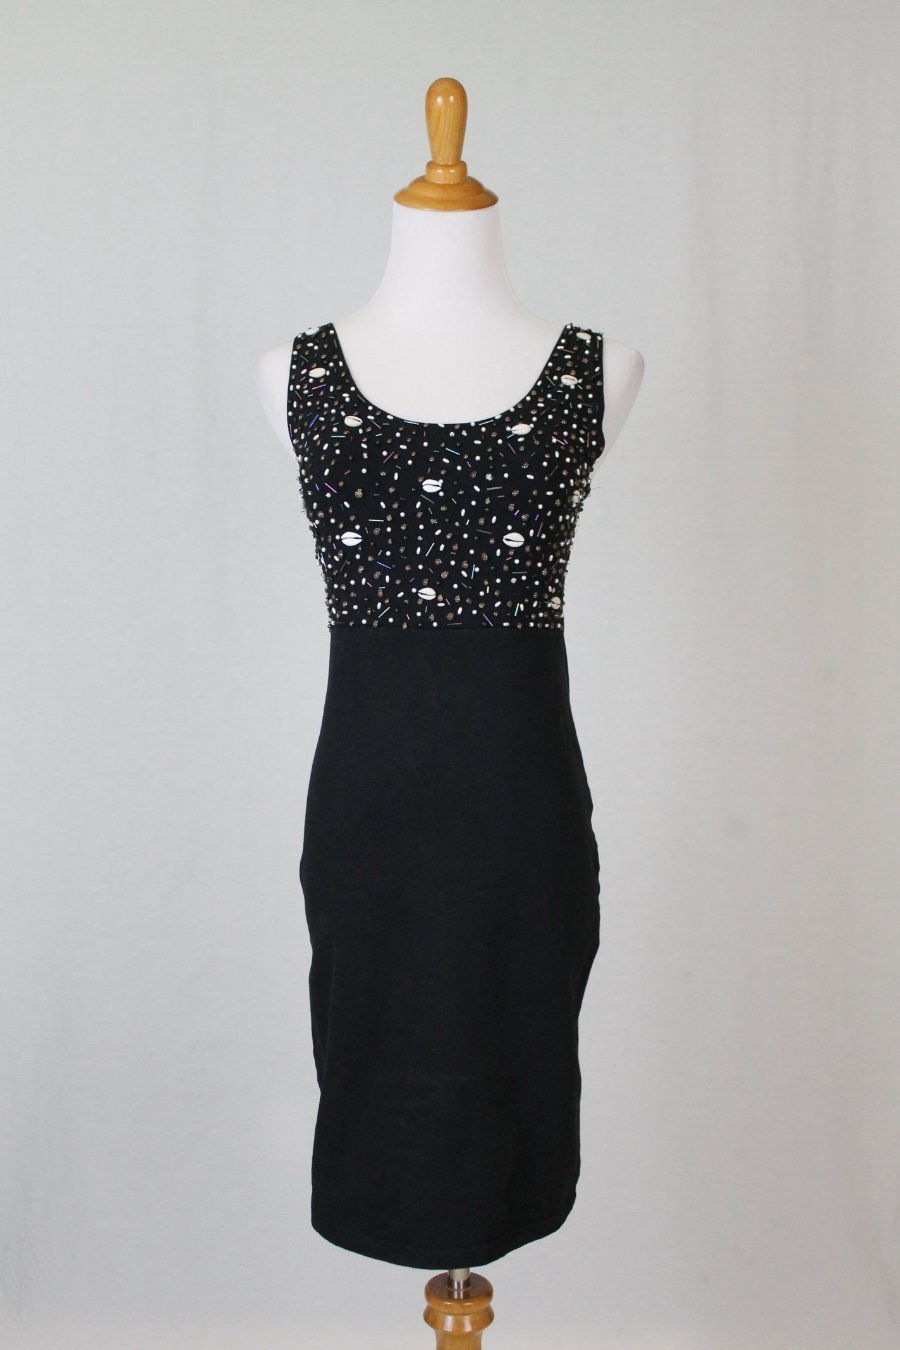 Vintage MISS SELFRIDGE 90's Seashells Beaded Black Cotton Bodycon Tank Dress M/L